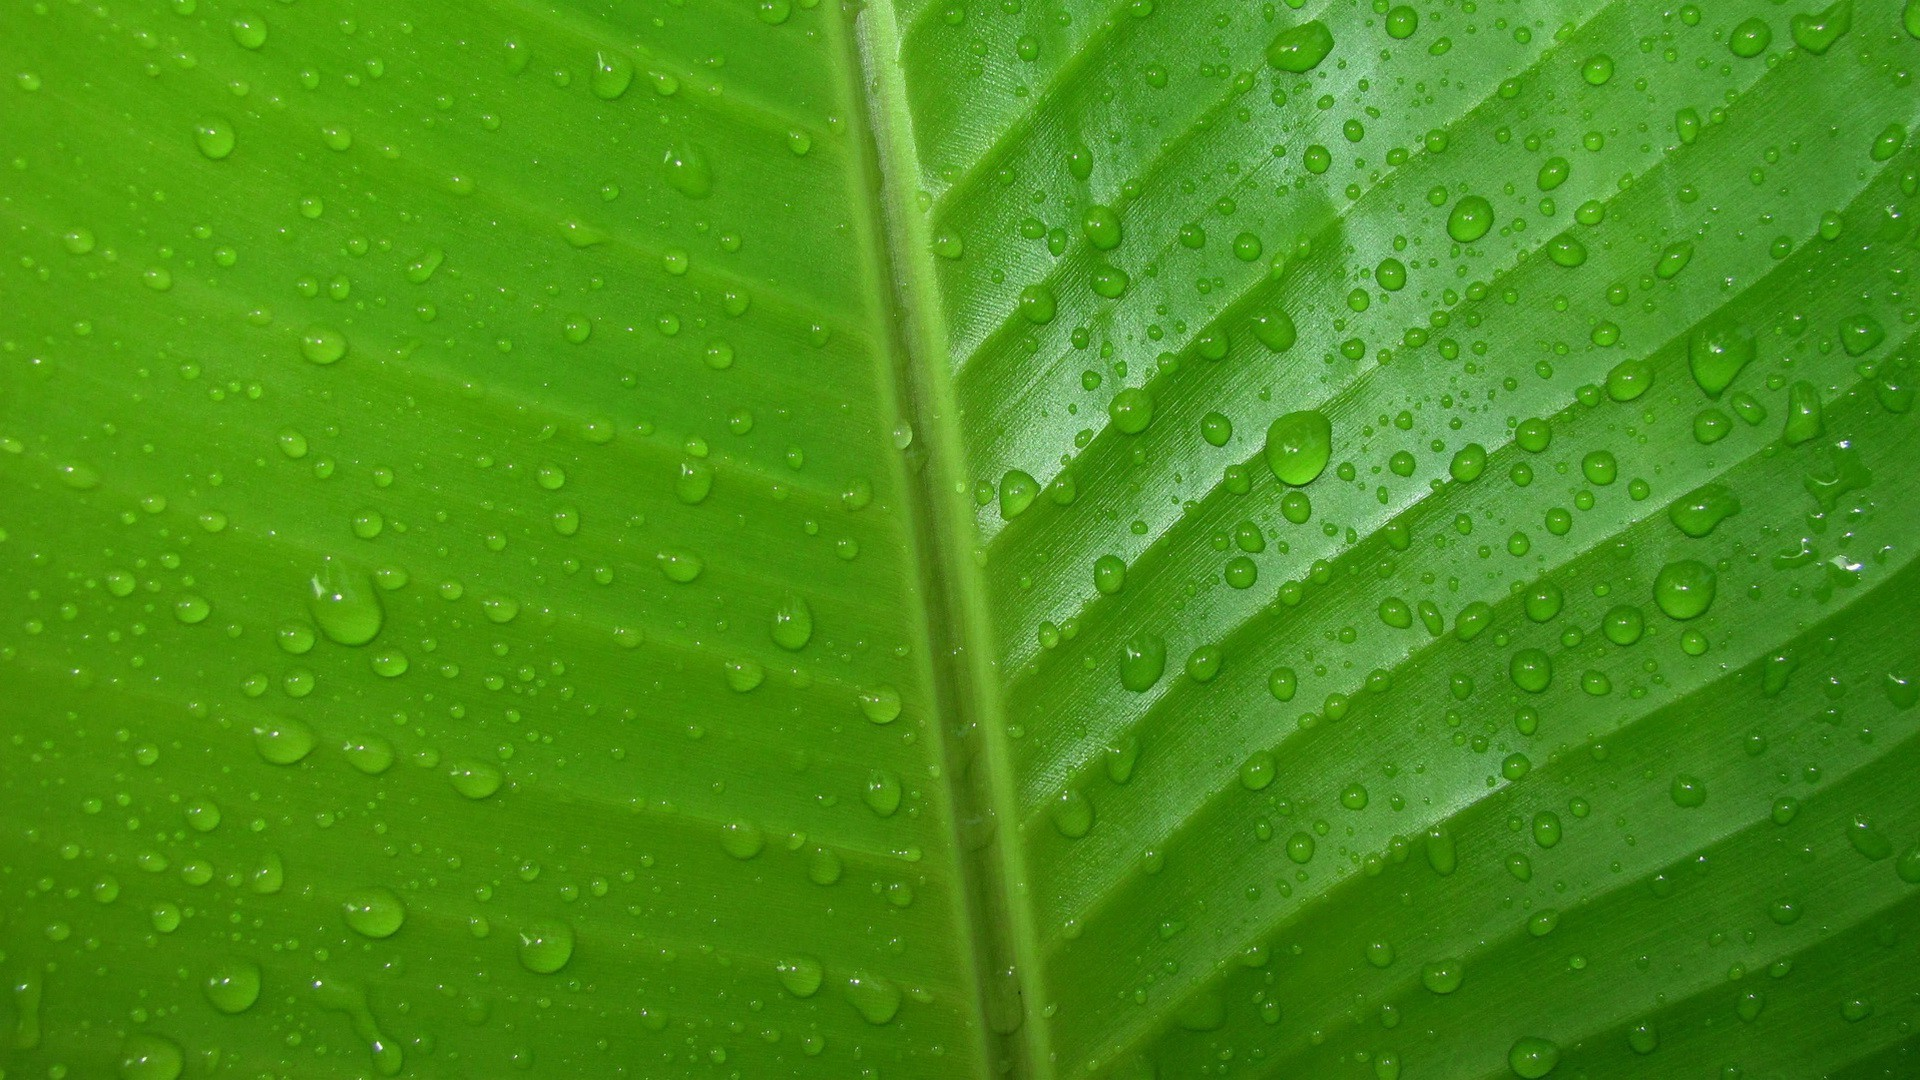 Green Leaf Wallpaper HD (70+ Images